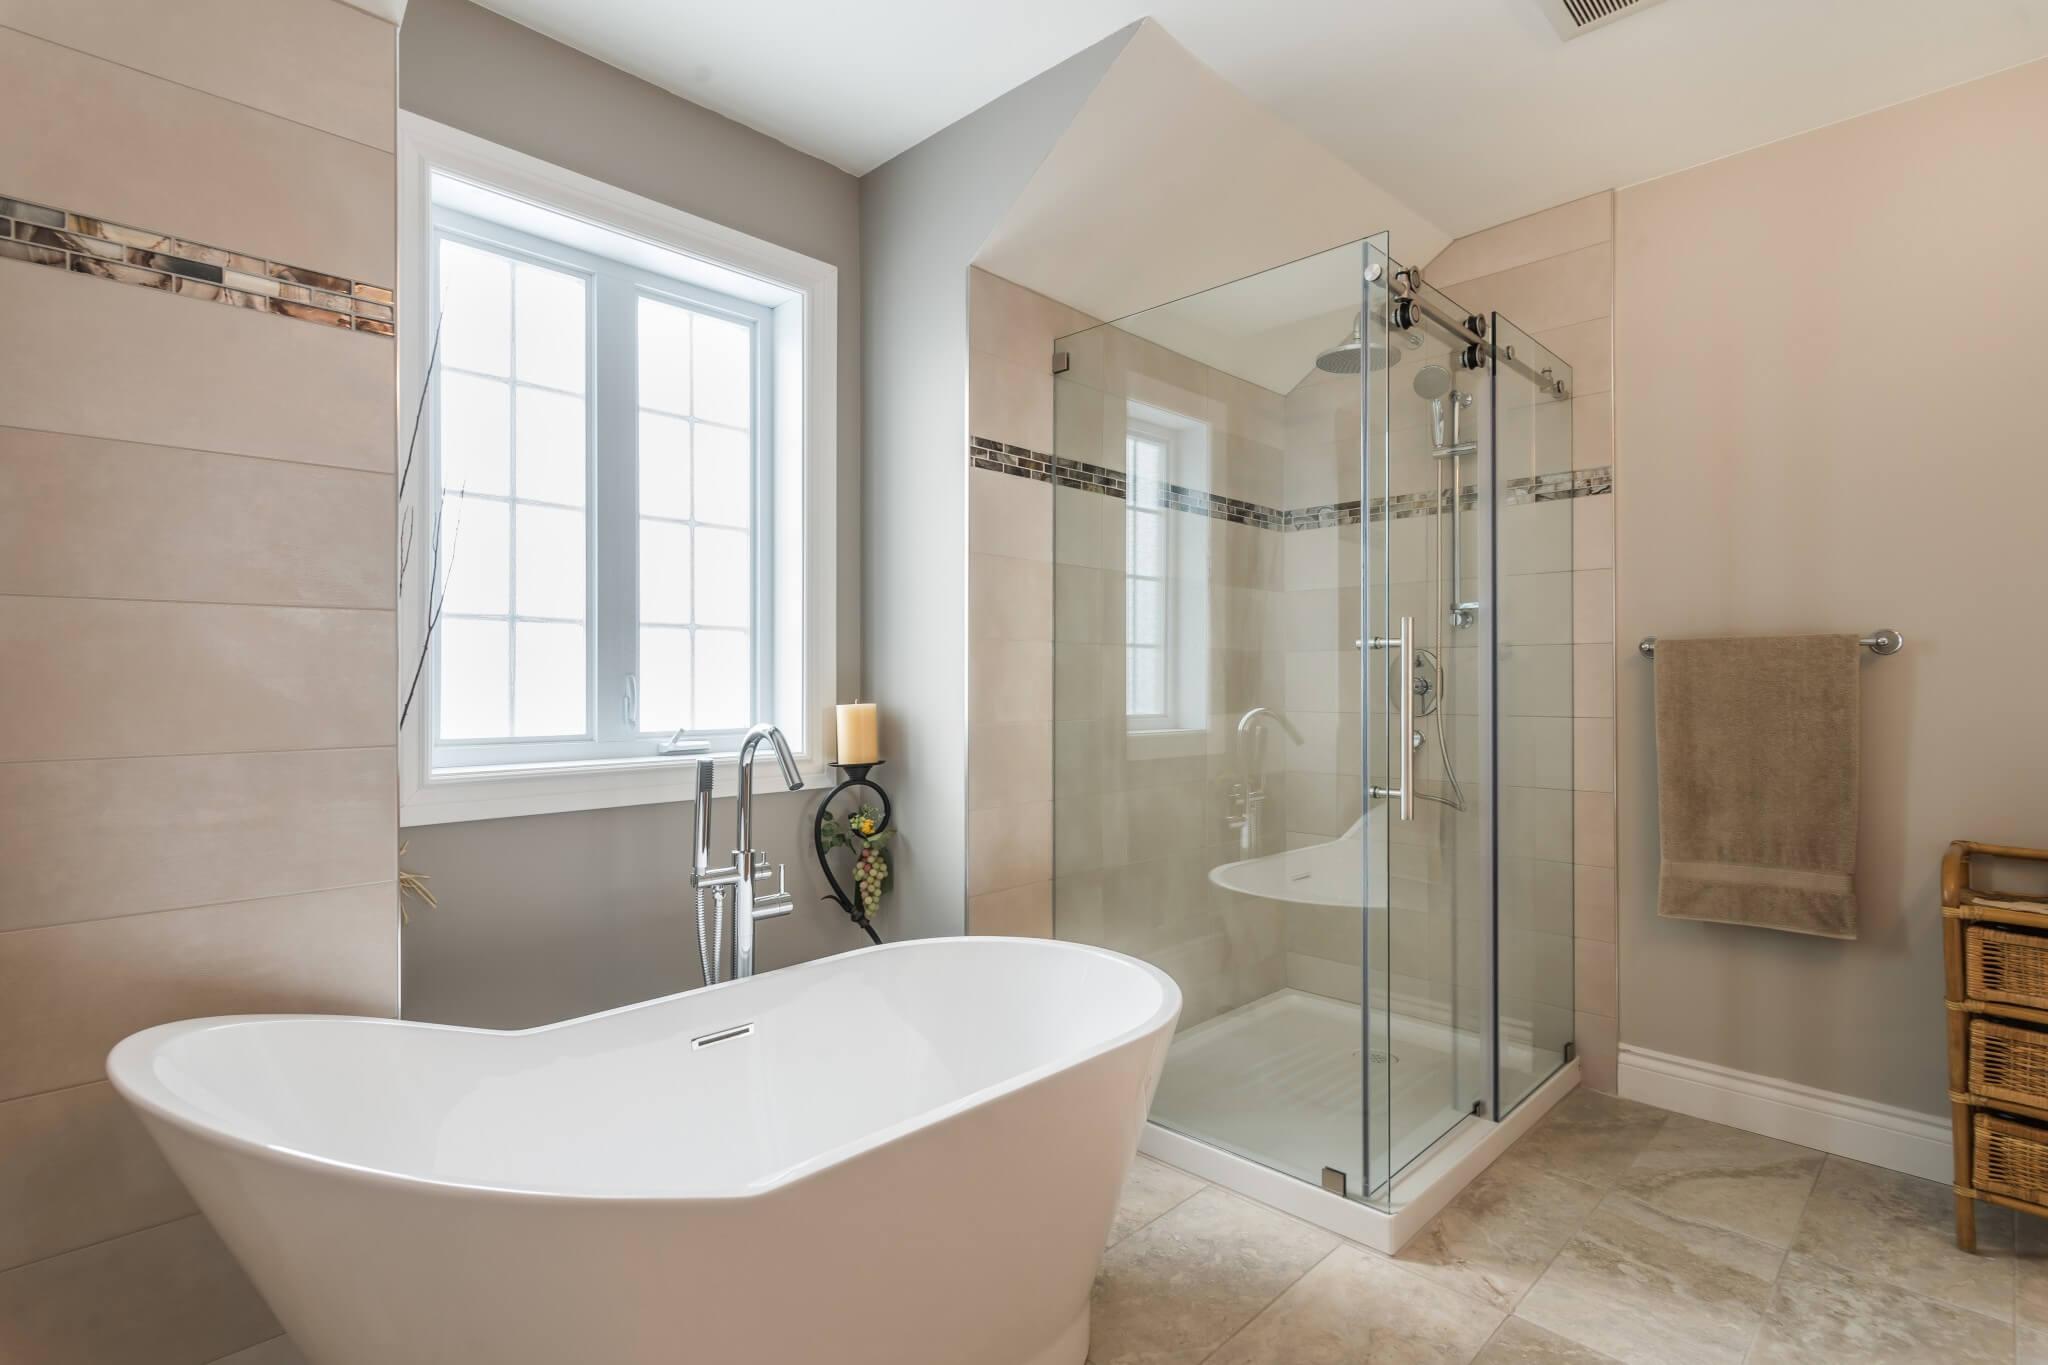 bain et douche salle de bain